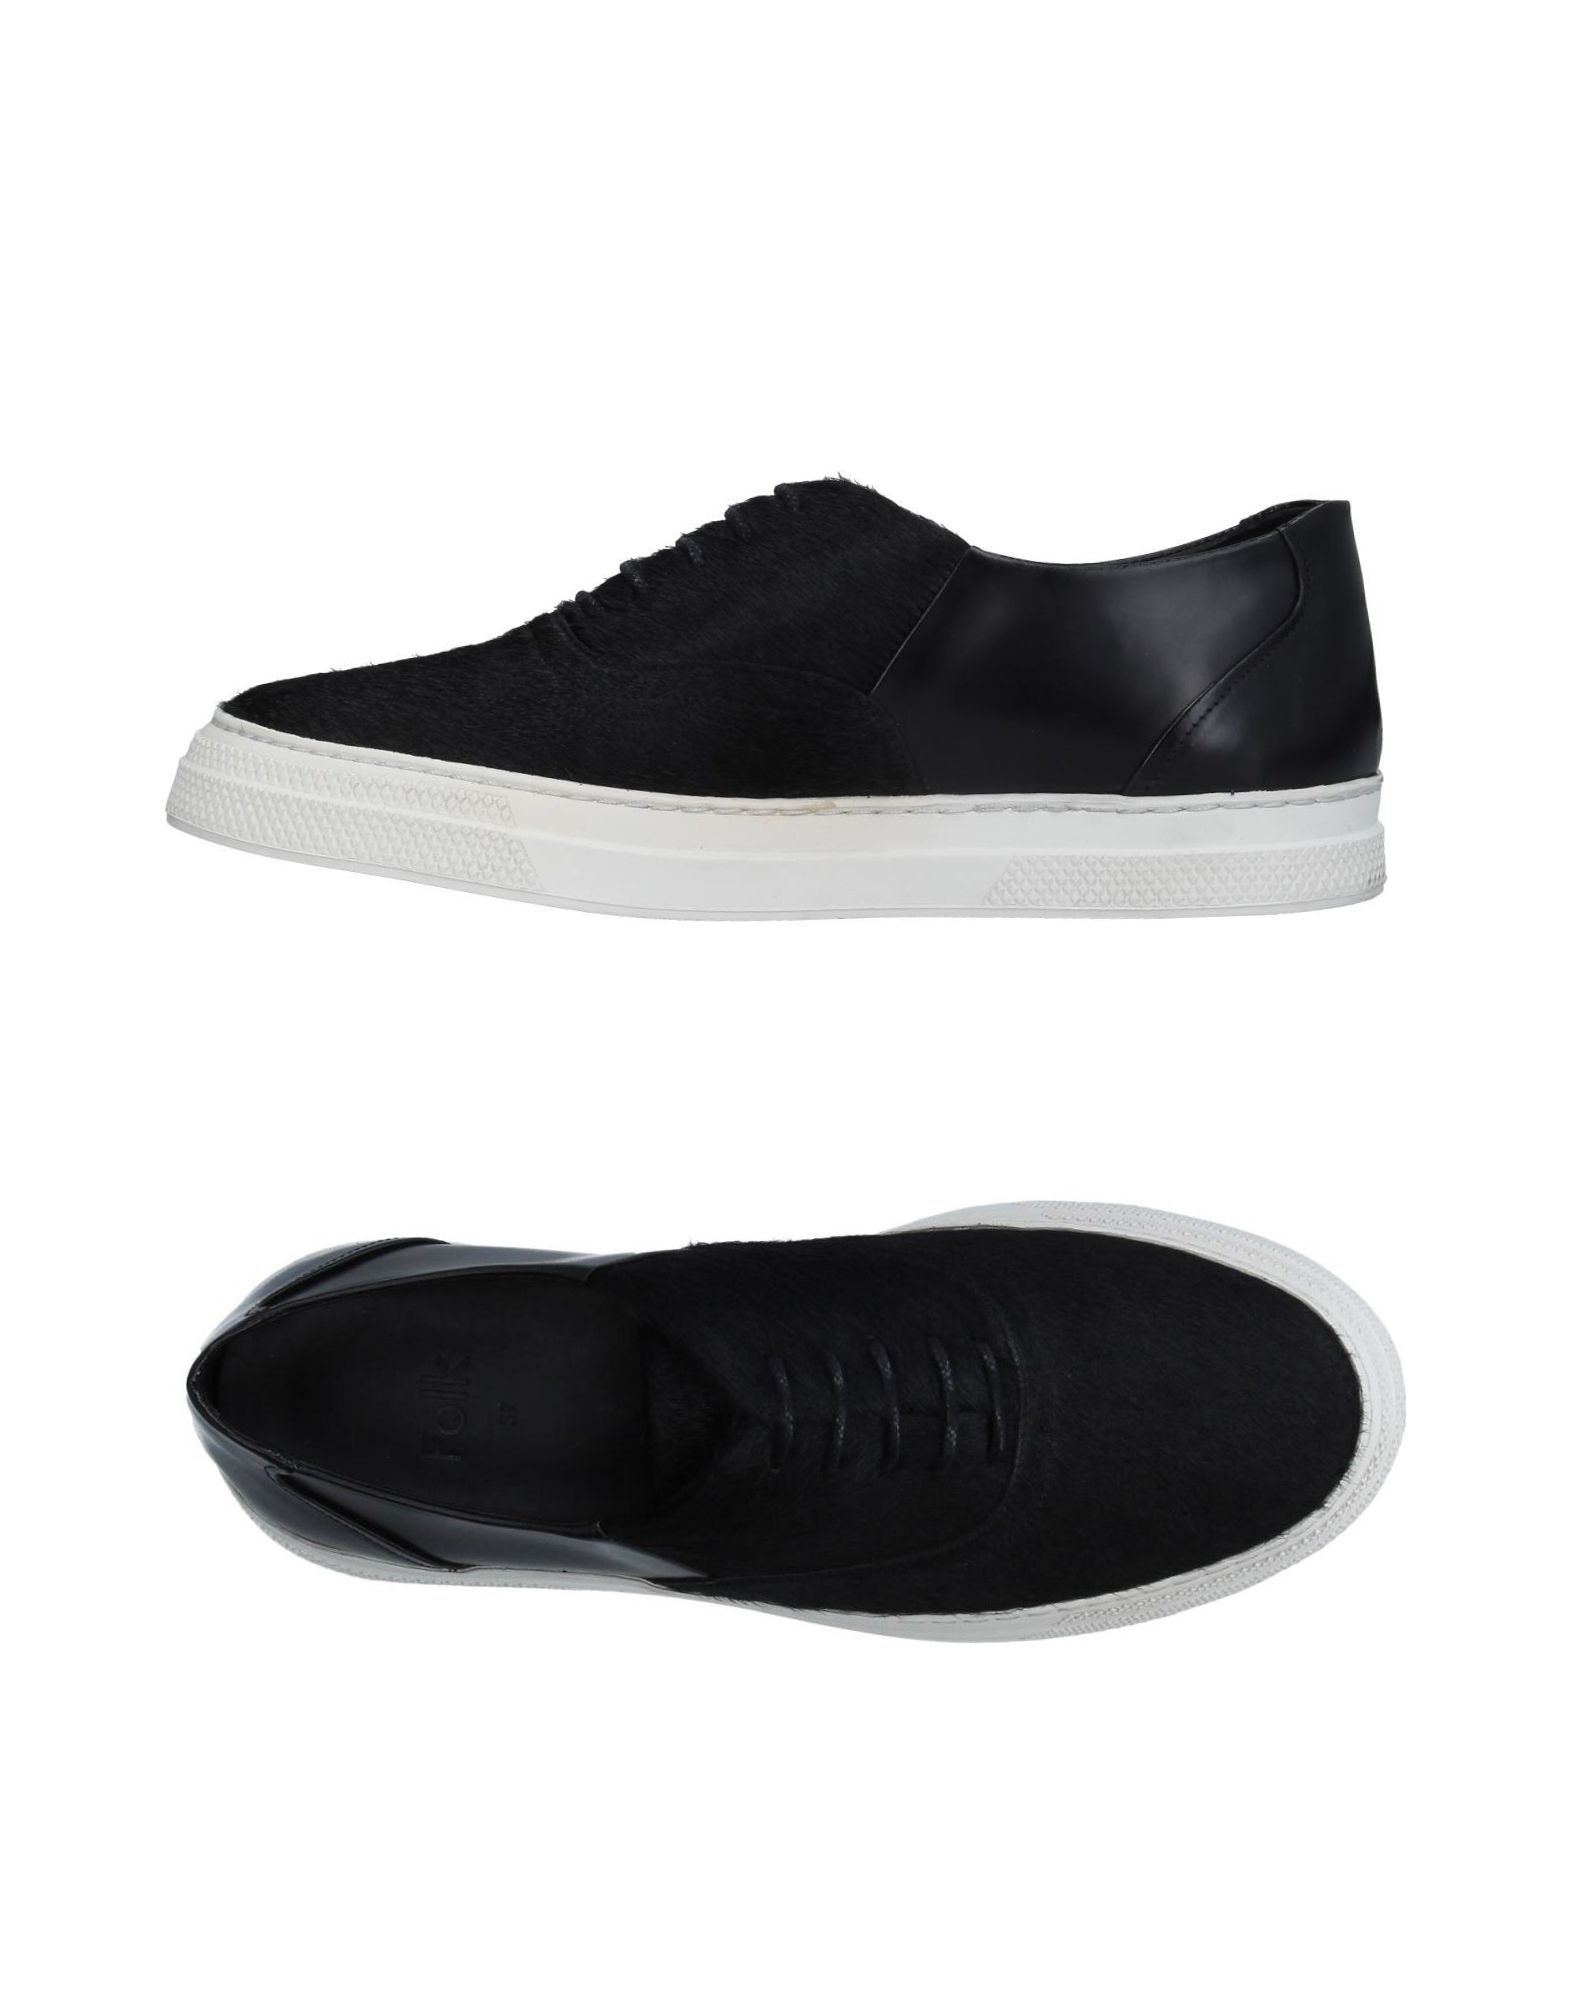 Folk Schnürschuhe Damen  11309473SK Gute Qualität beliebte Schuhe